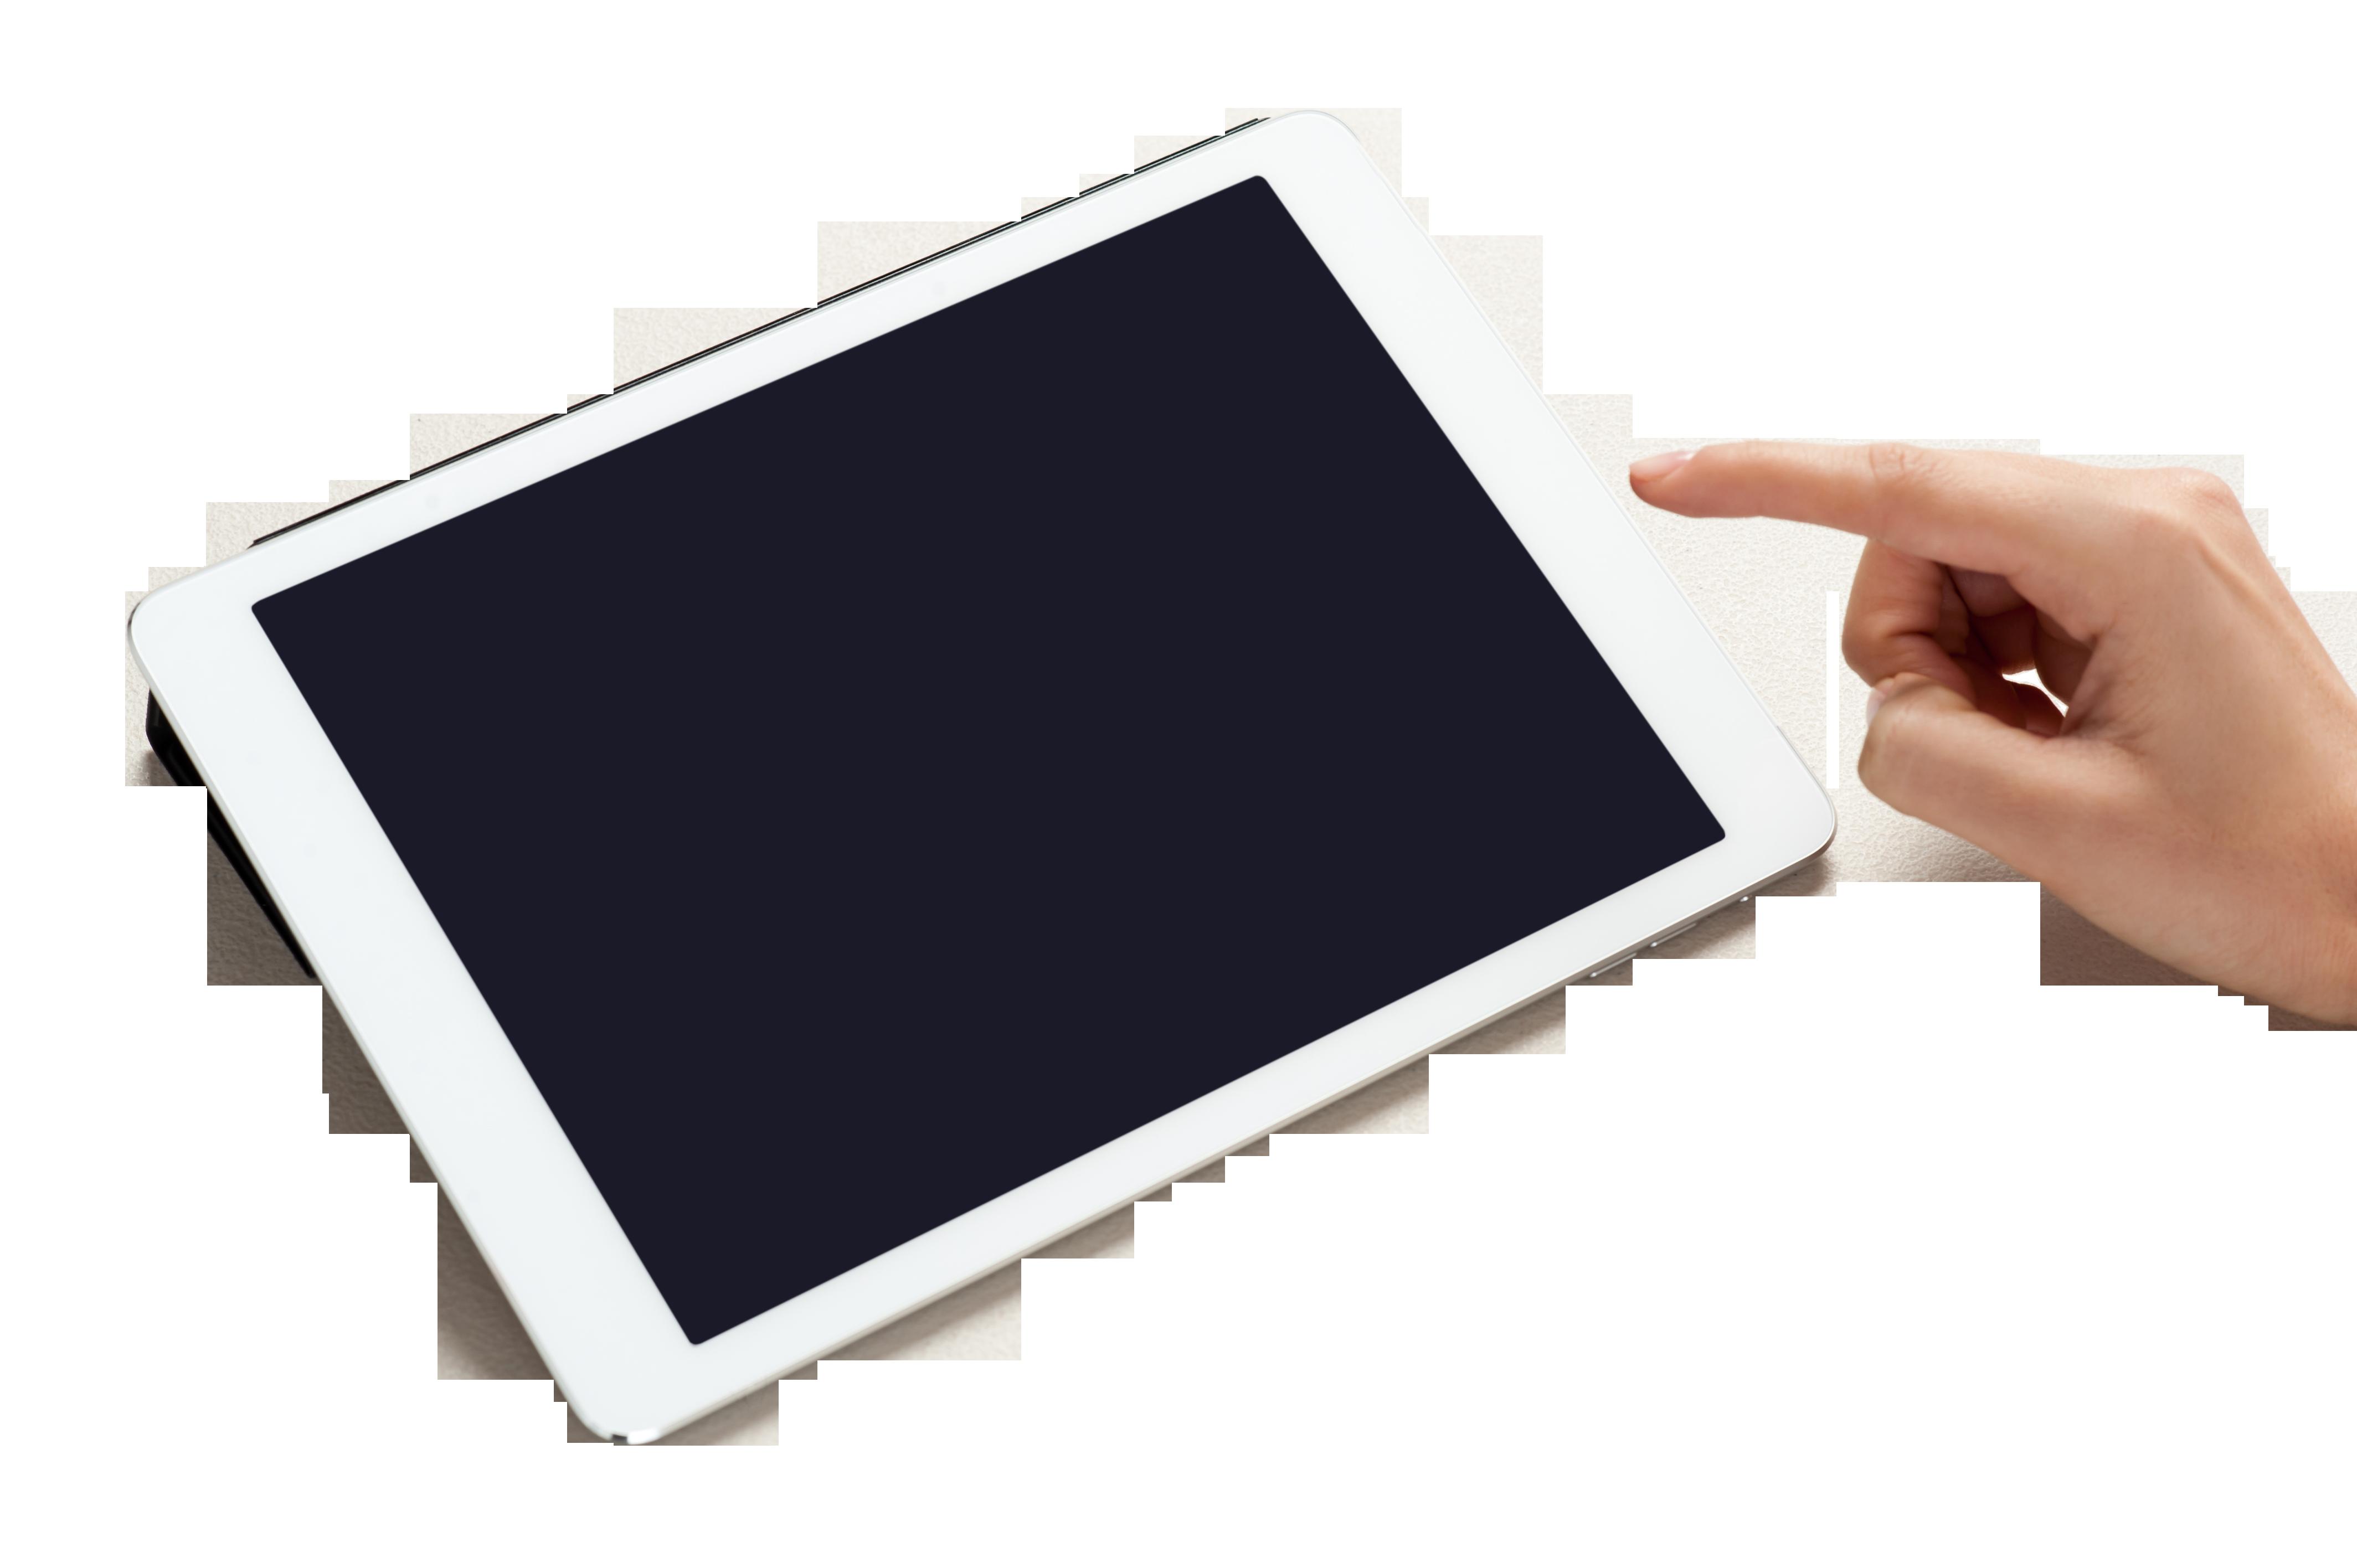 Tablet PNG Image